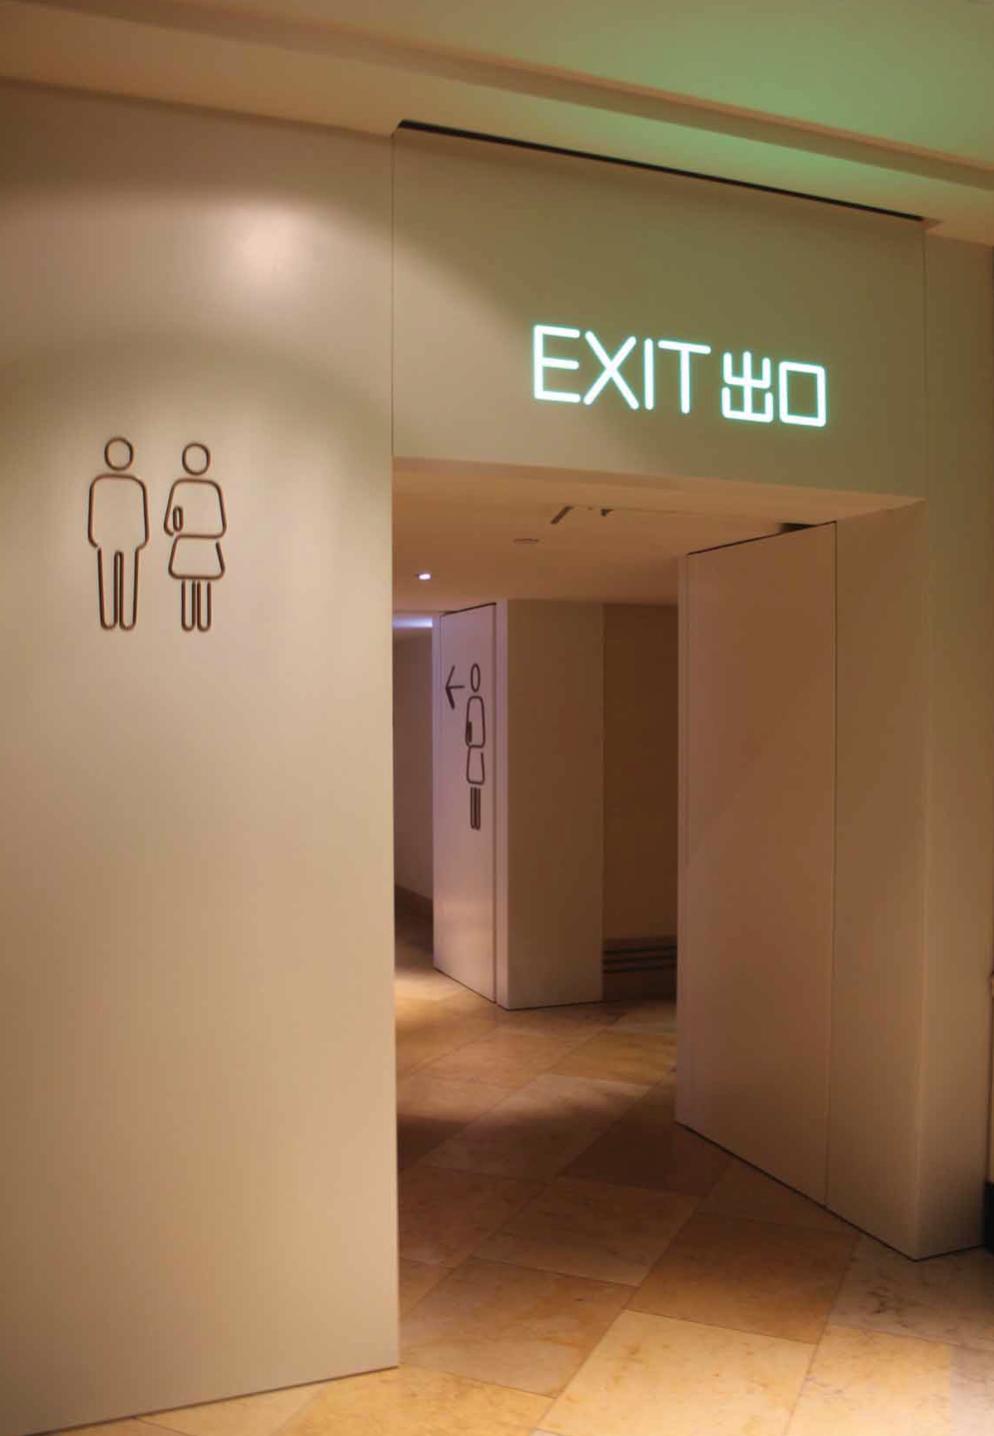 Toilet Sign | China